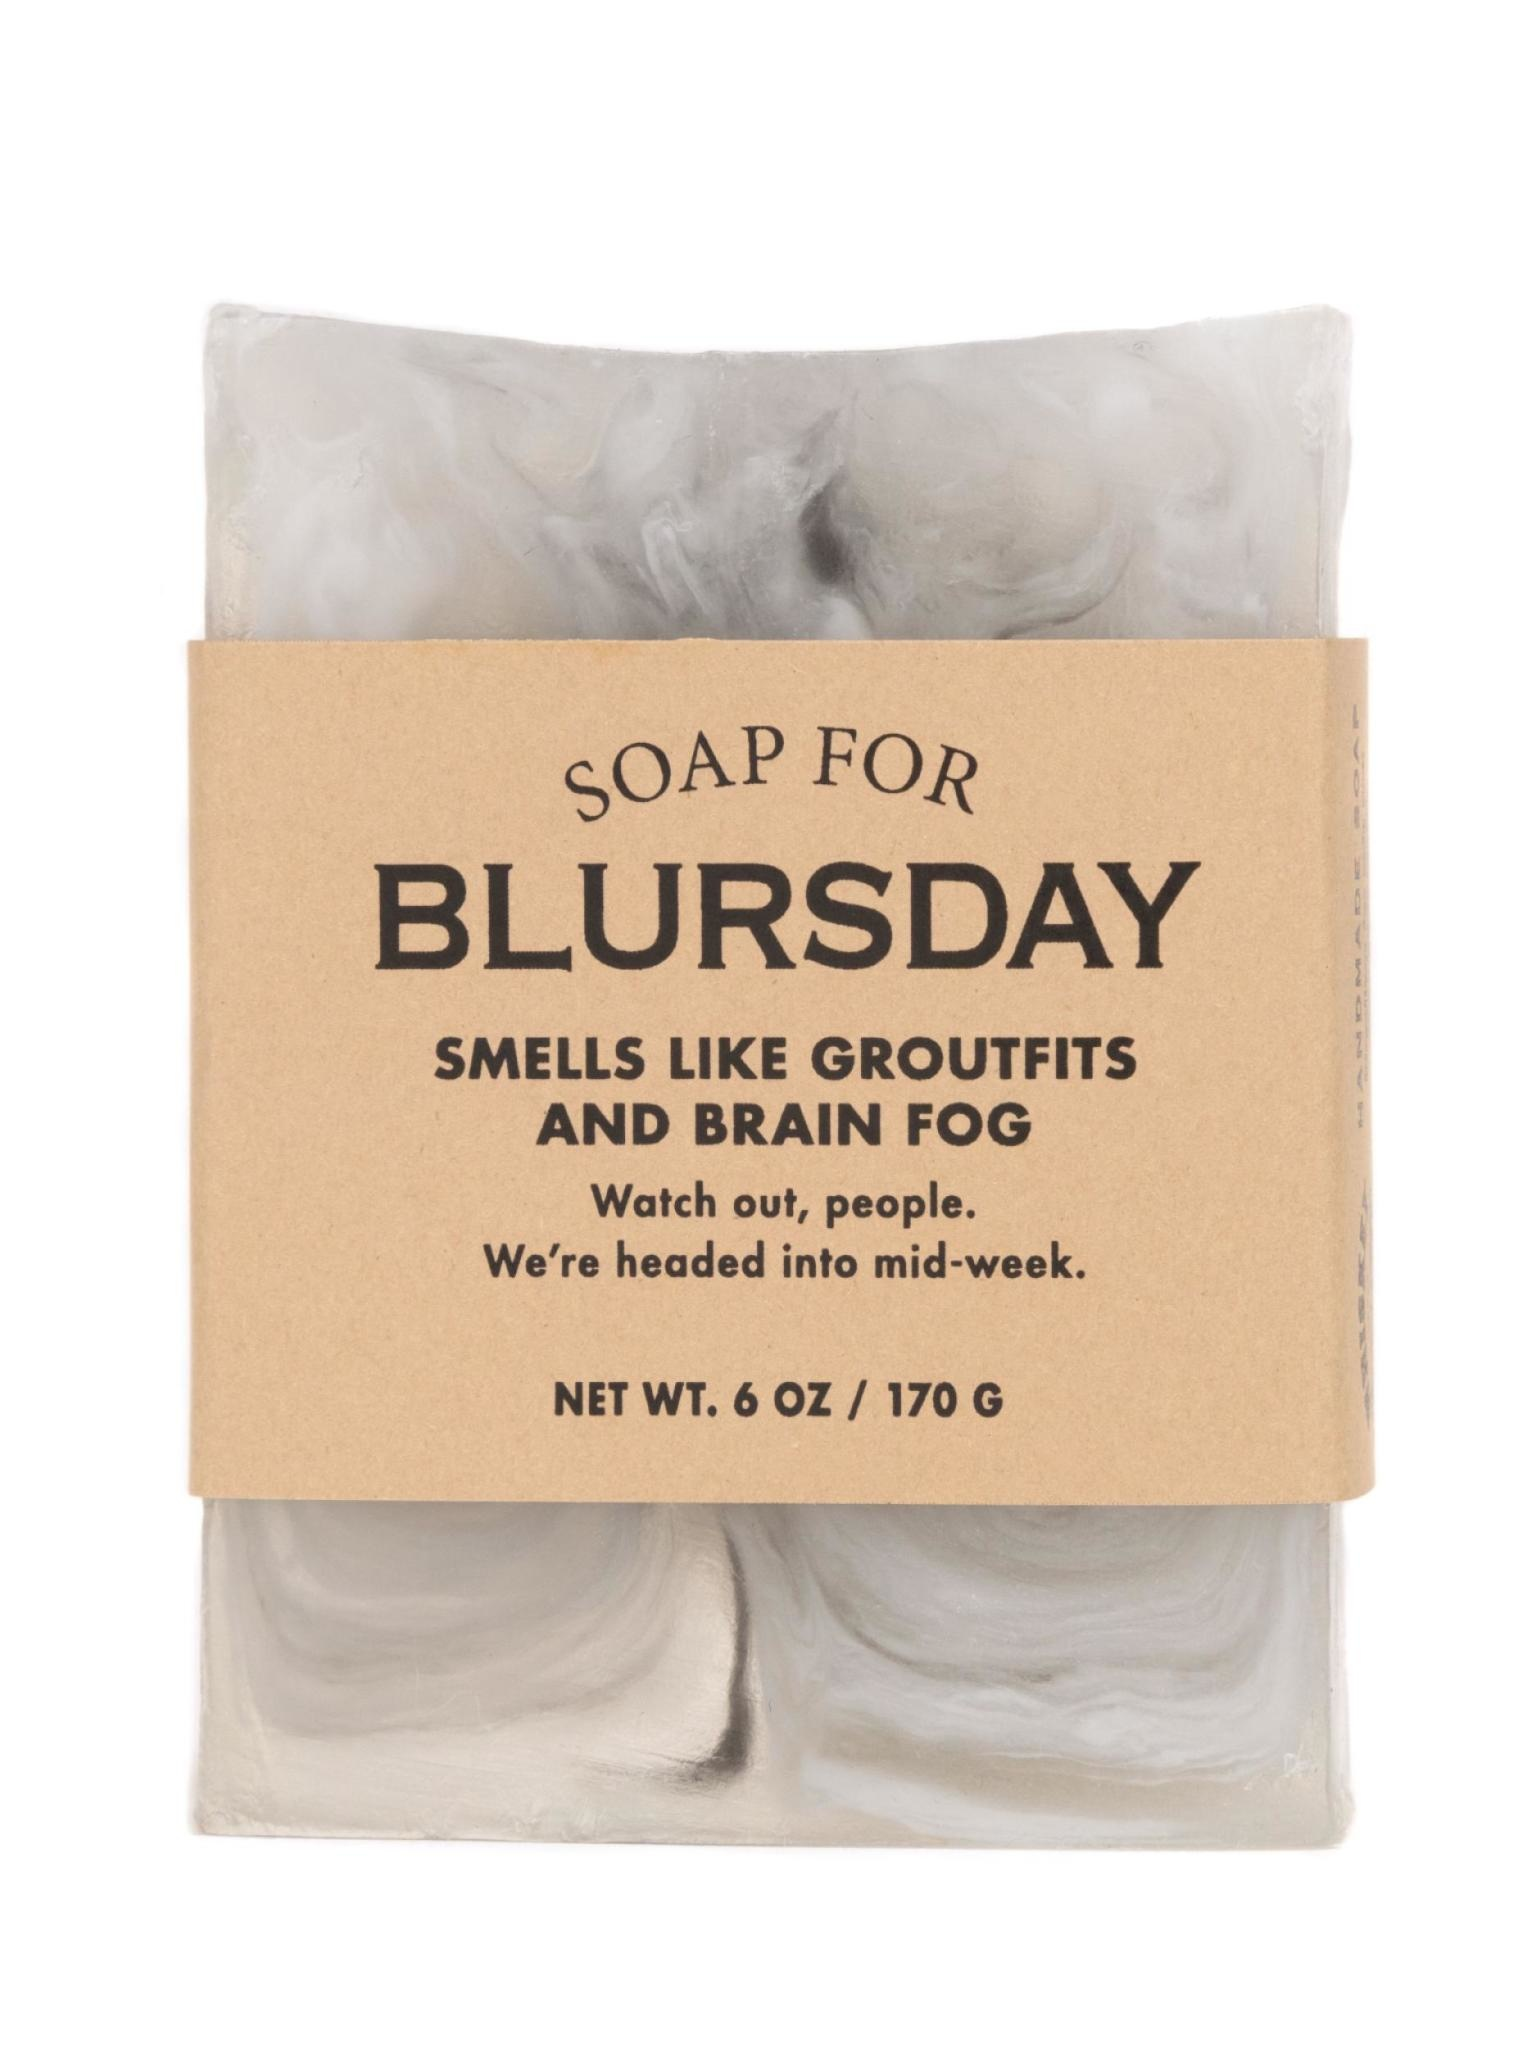 Whiskey River Soap Co. Blursday Soap 6 oz